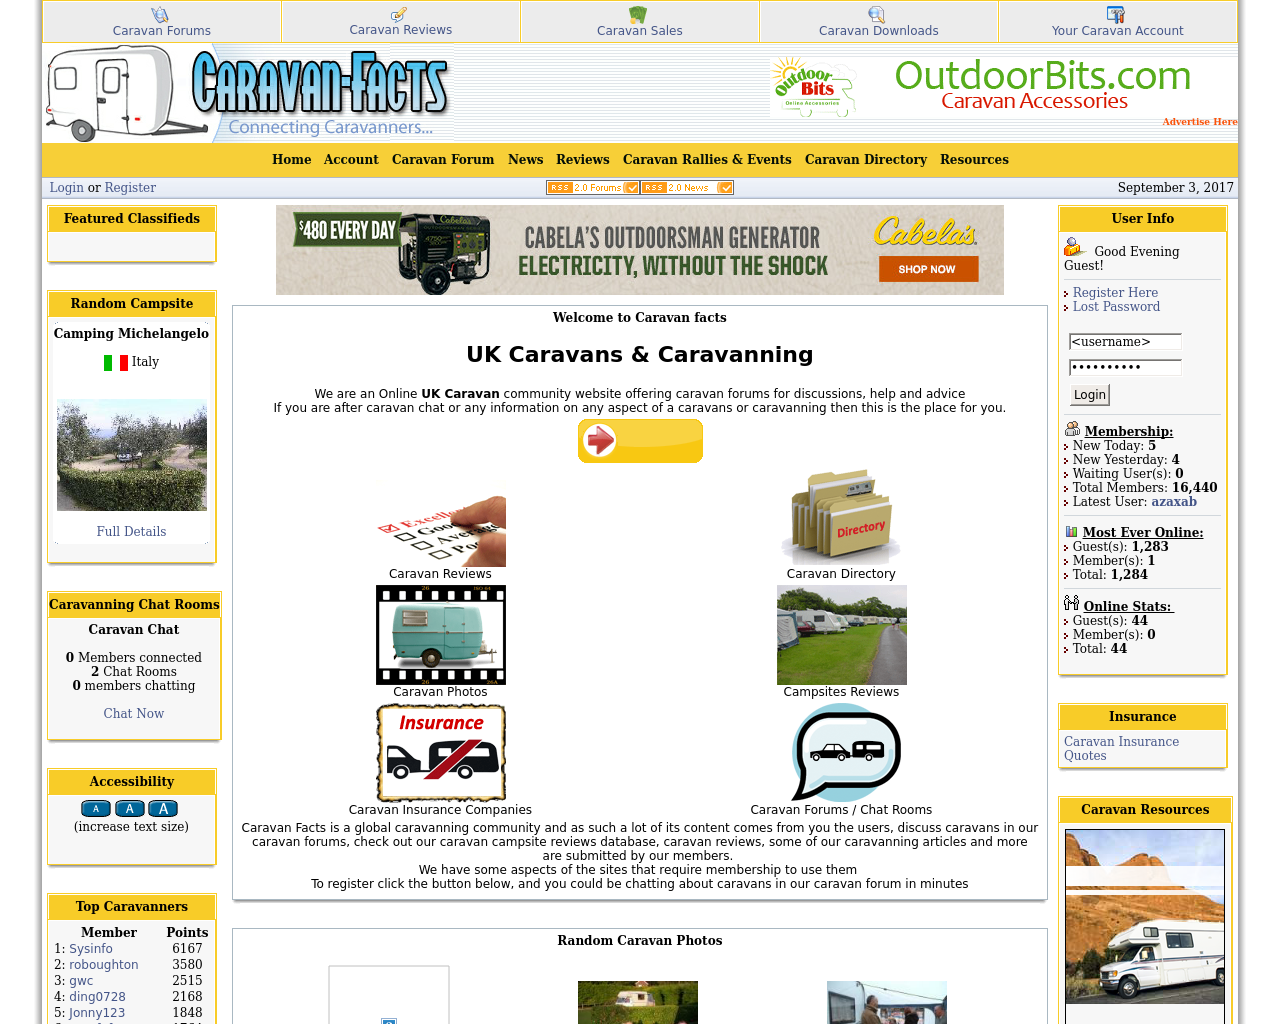 Caravan-Facts-Advertising-Reviews-Pricing